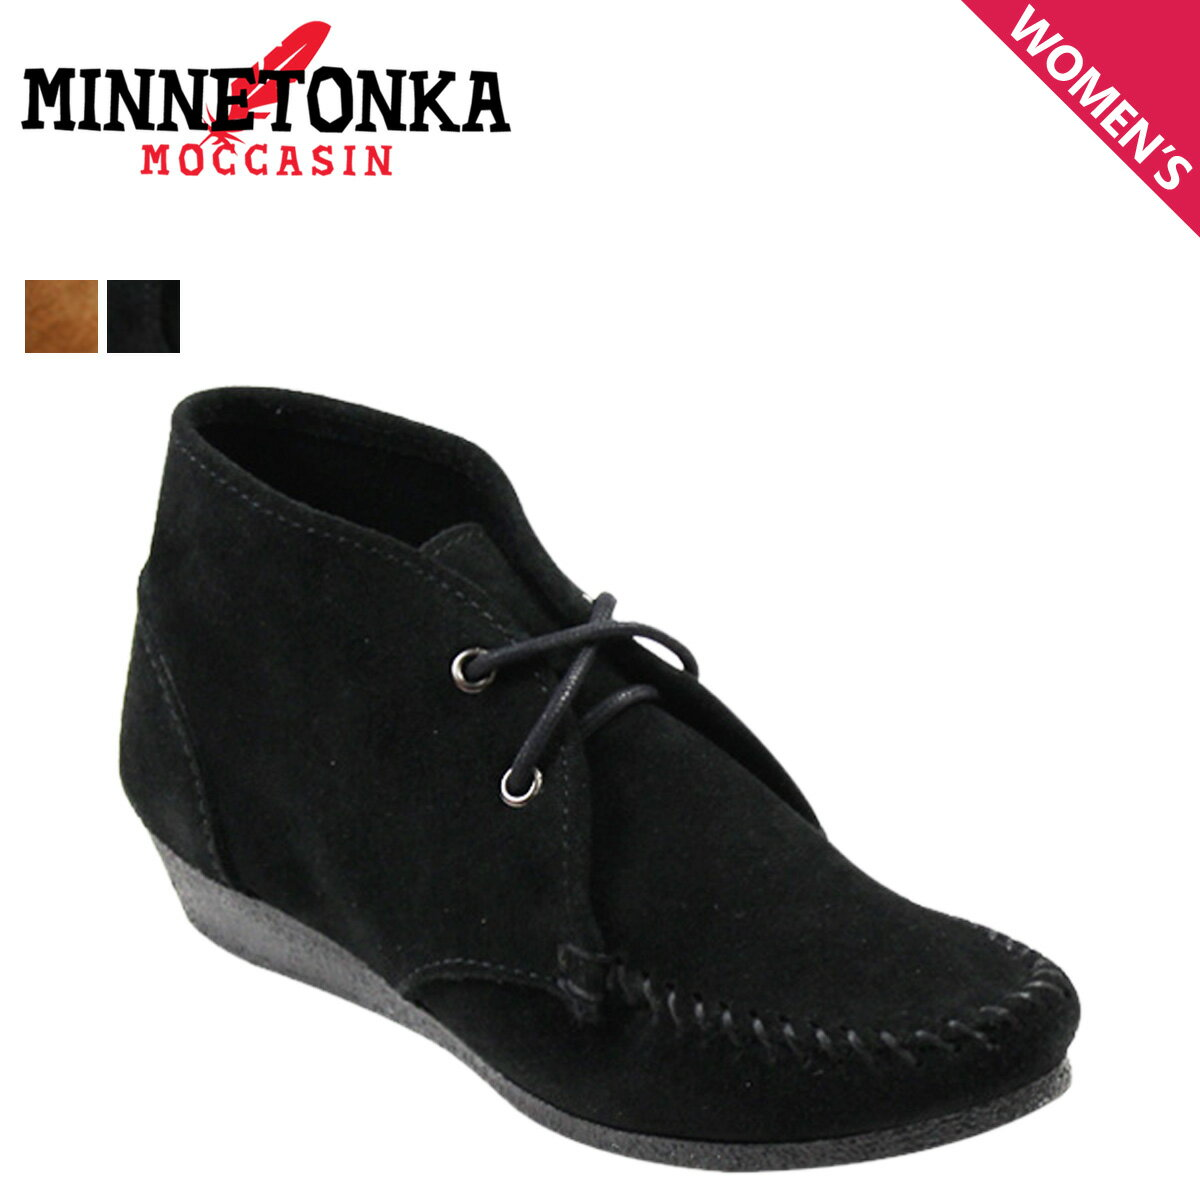 MINNETONKA ミネトンカ チャッカ ウェッジ ブーティ ブーツ  CHUKKA WEDGE BOOTIE  レディース